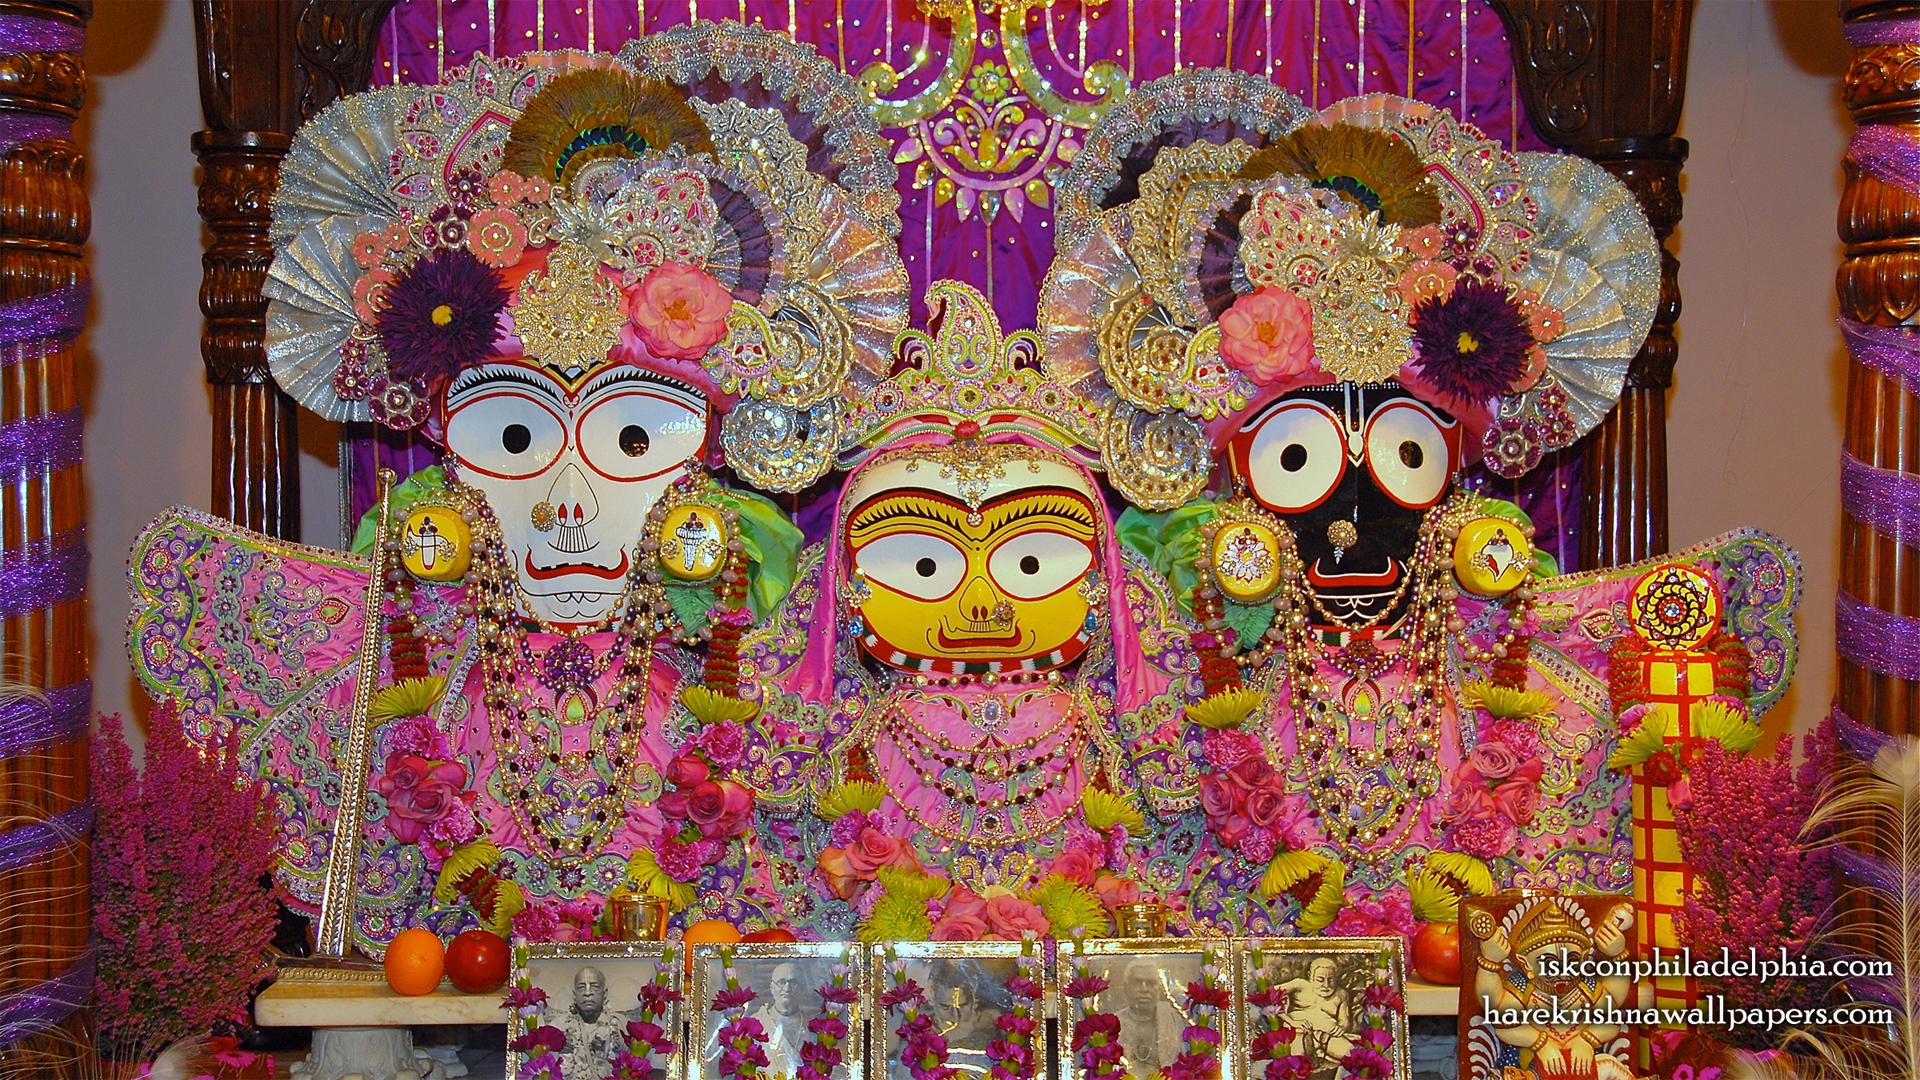 Jagannath Baladeva Subhadra Wallpaper (009) Size 1920x1080 Download